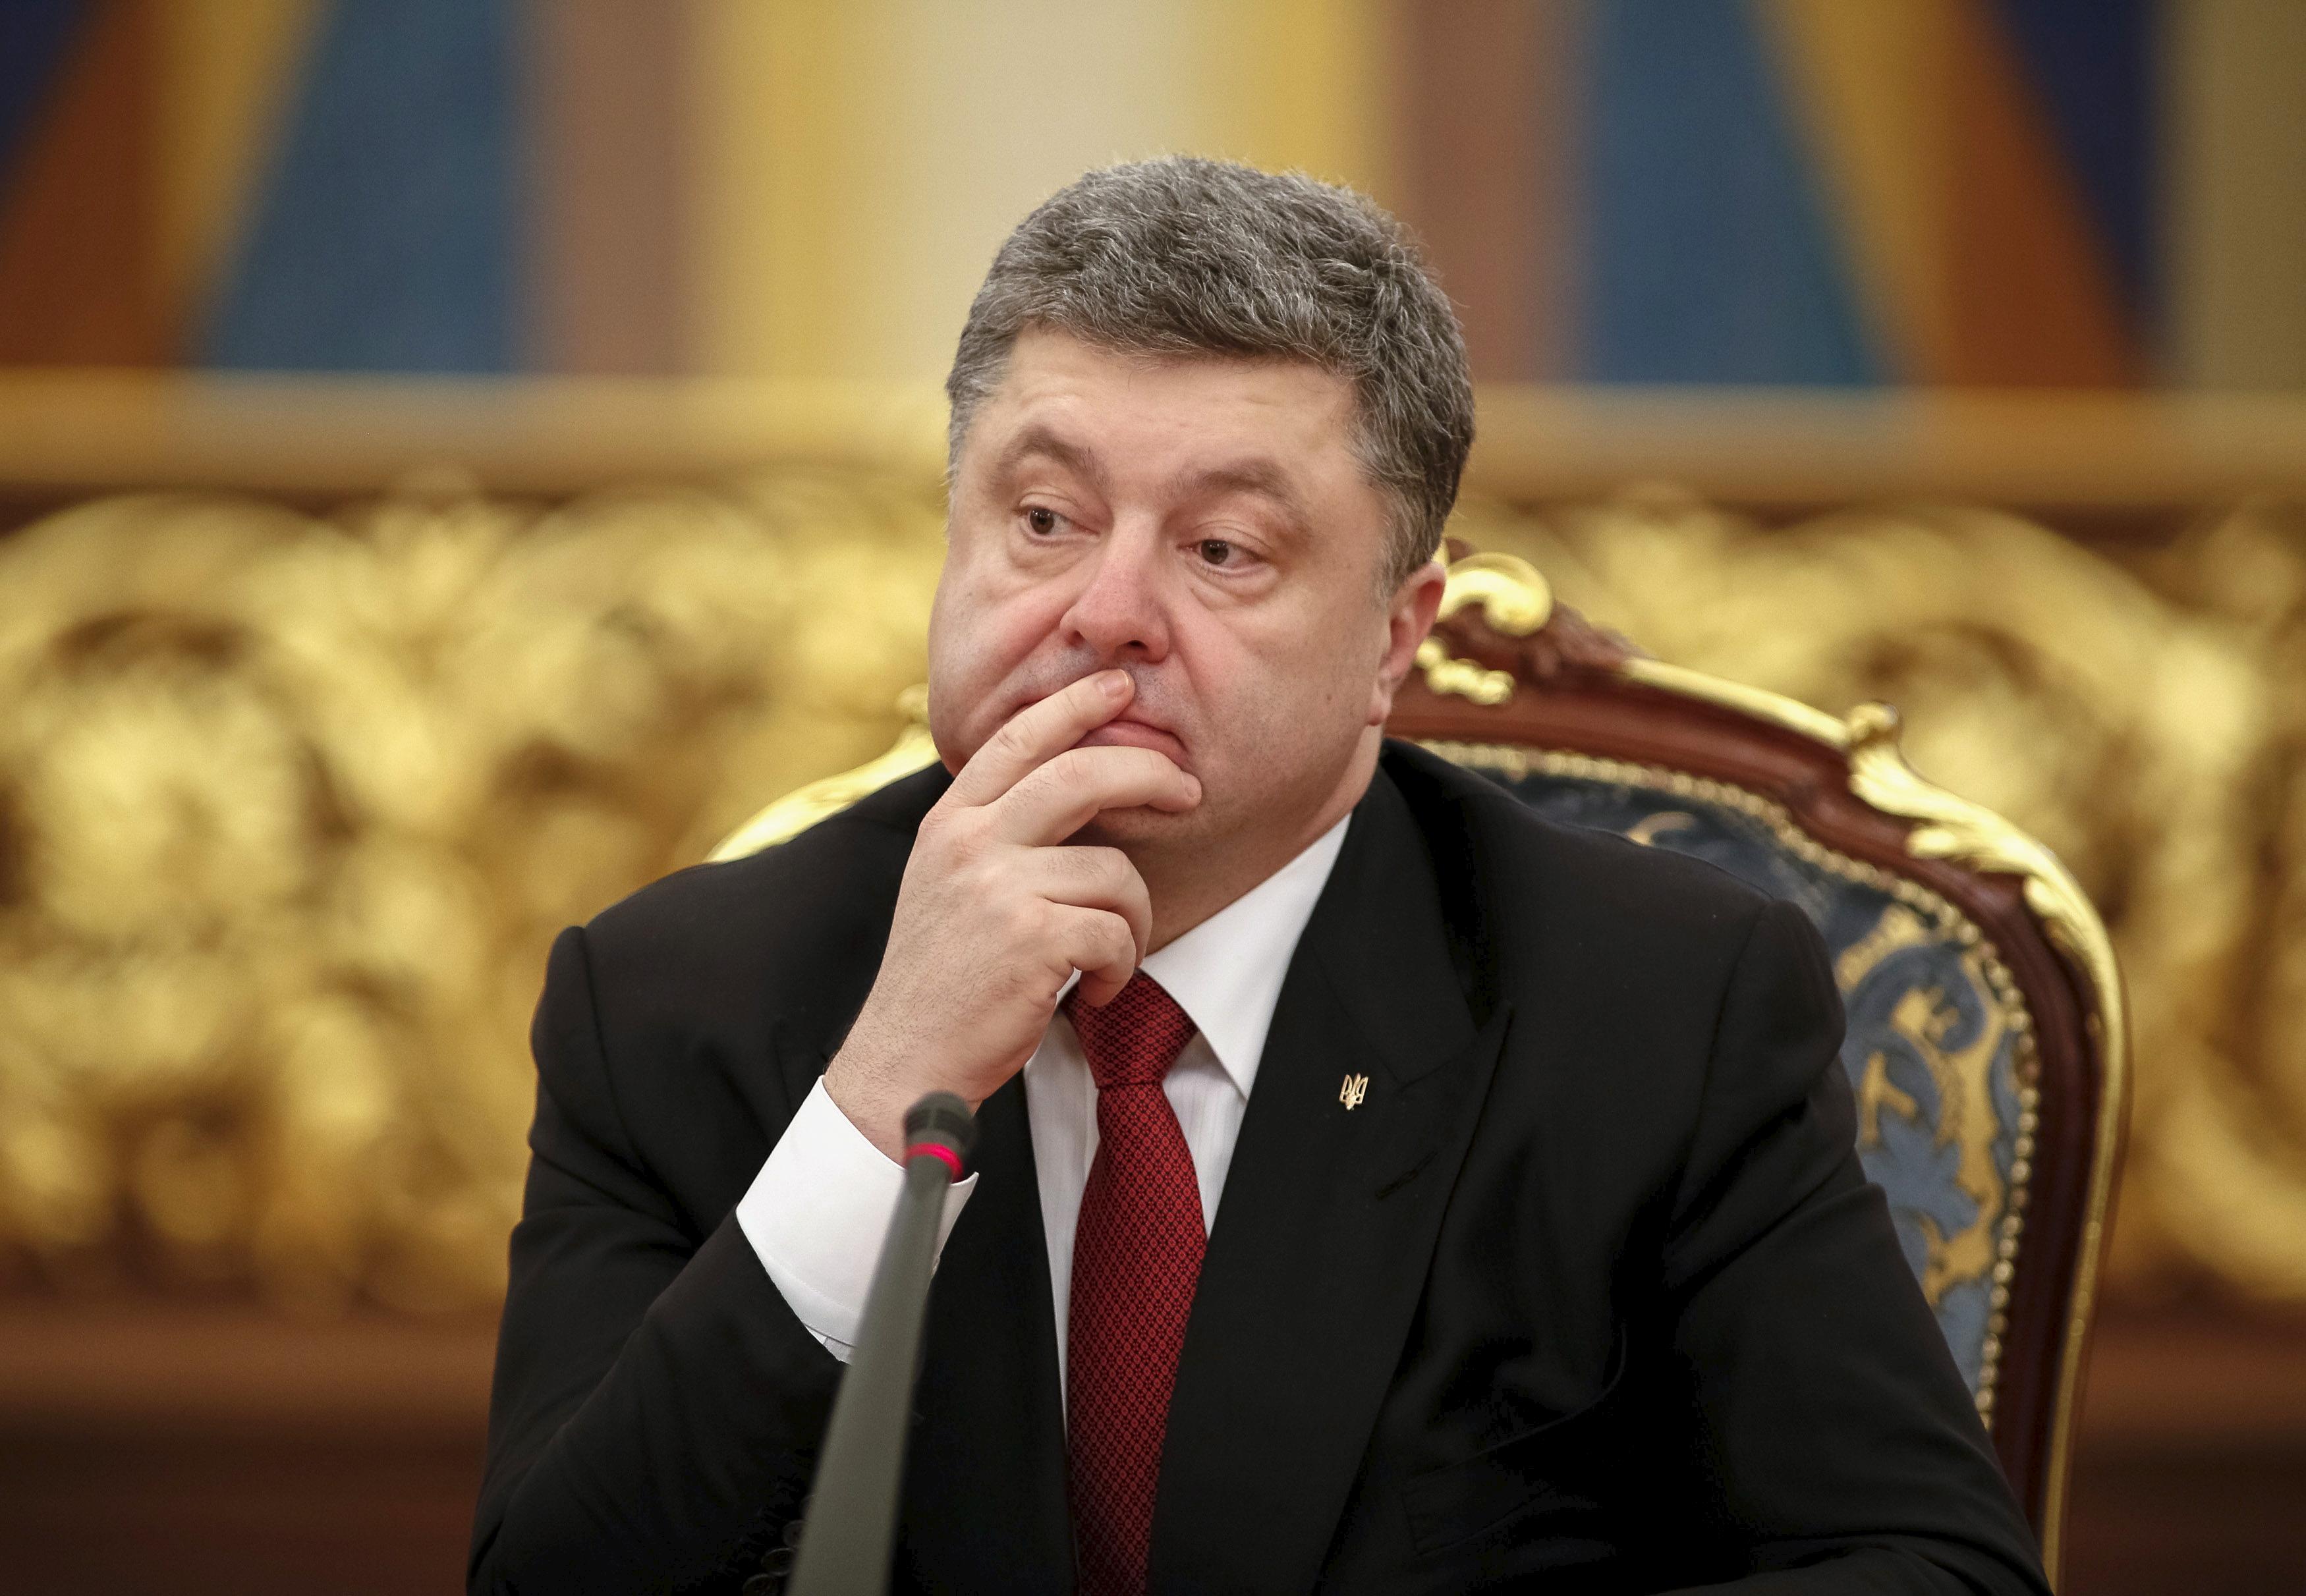 Liderul de la Kiev, Petro Poroshenko, face promisiuni electorale deșarte